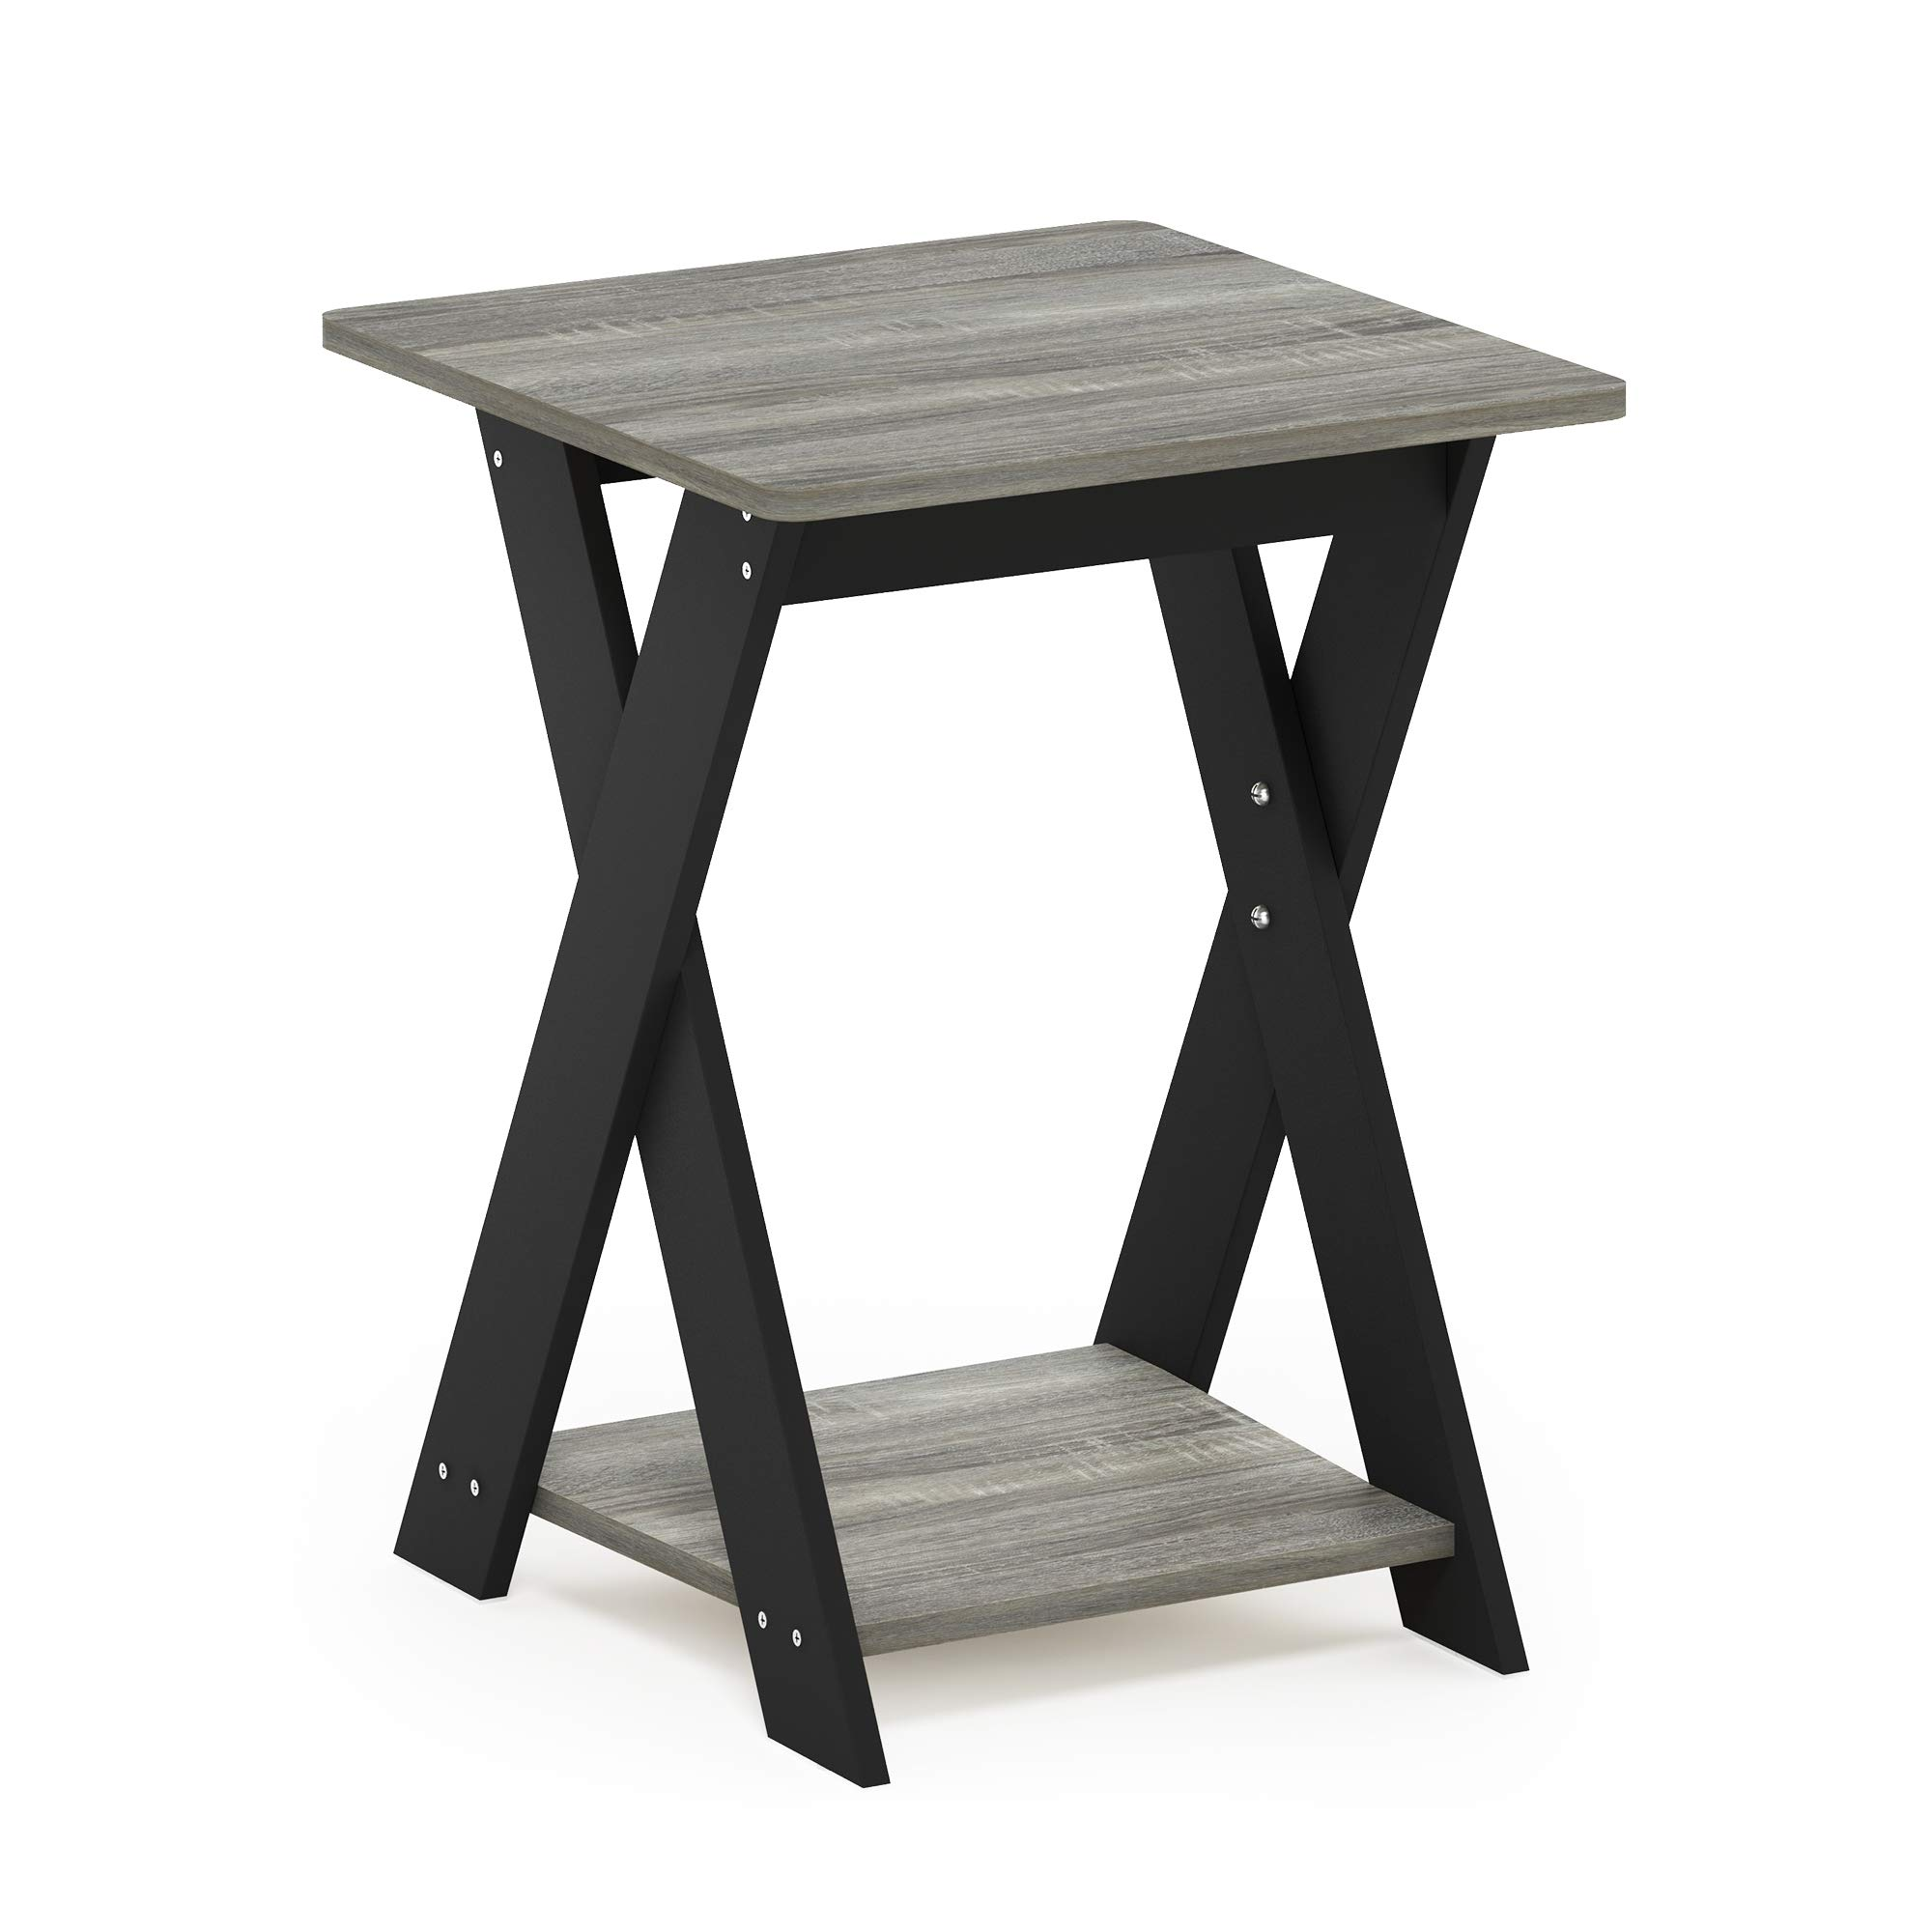 Furinno Modern Simplistic Criss Crossed End Table French Oak Grey Furniture Decor